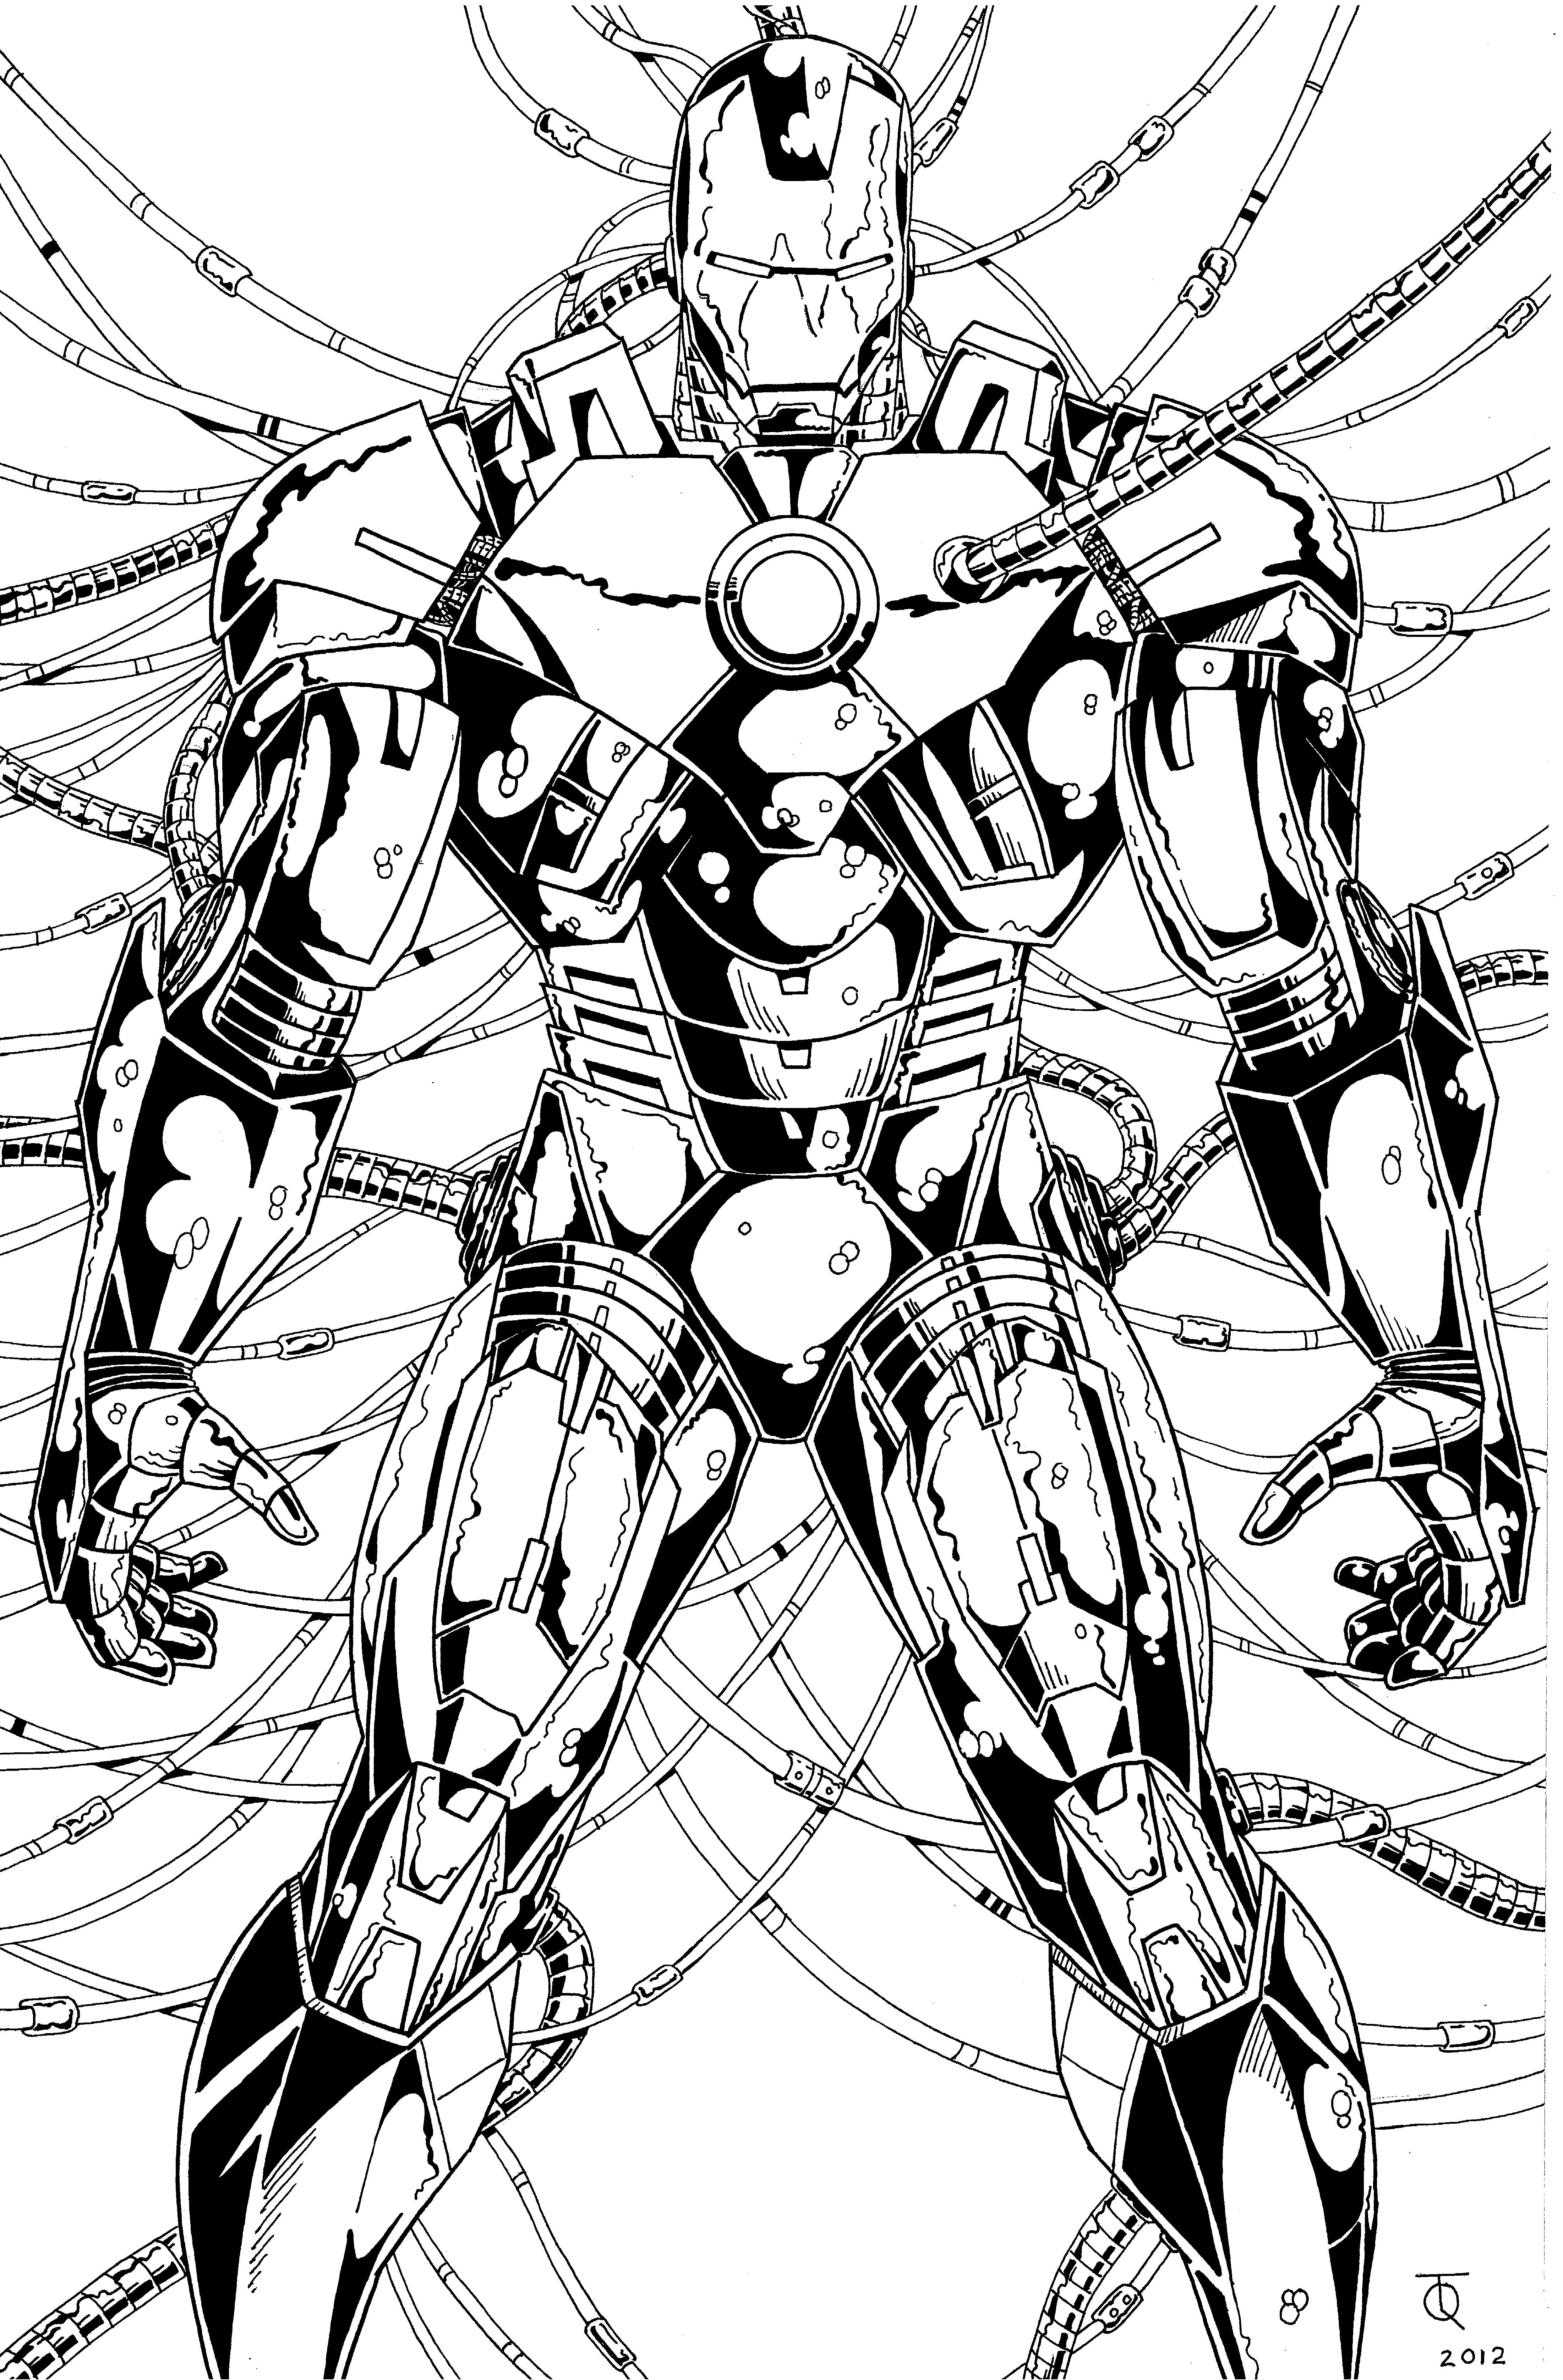 iron man 3 drawing at getdrawings  free download